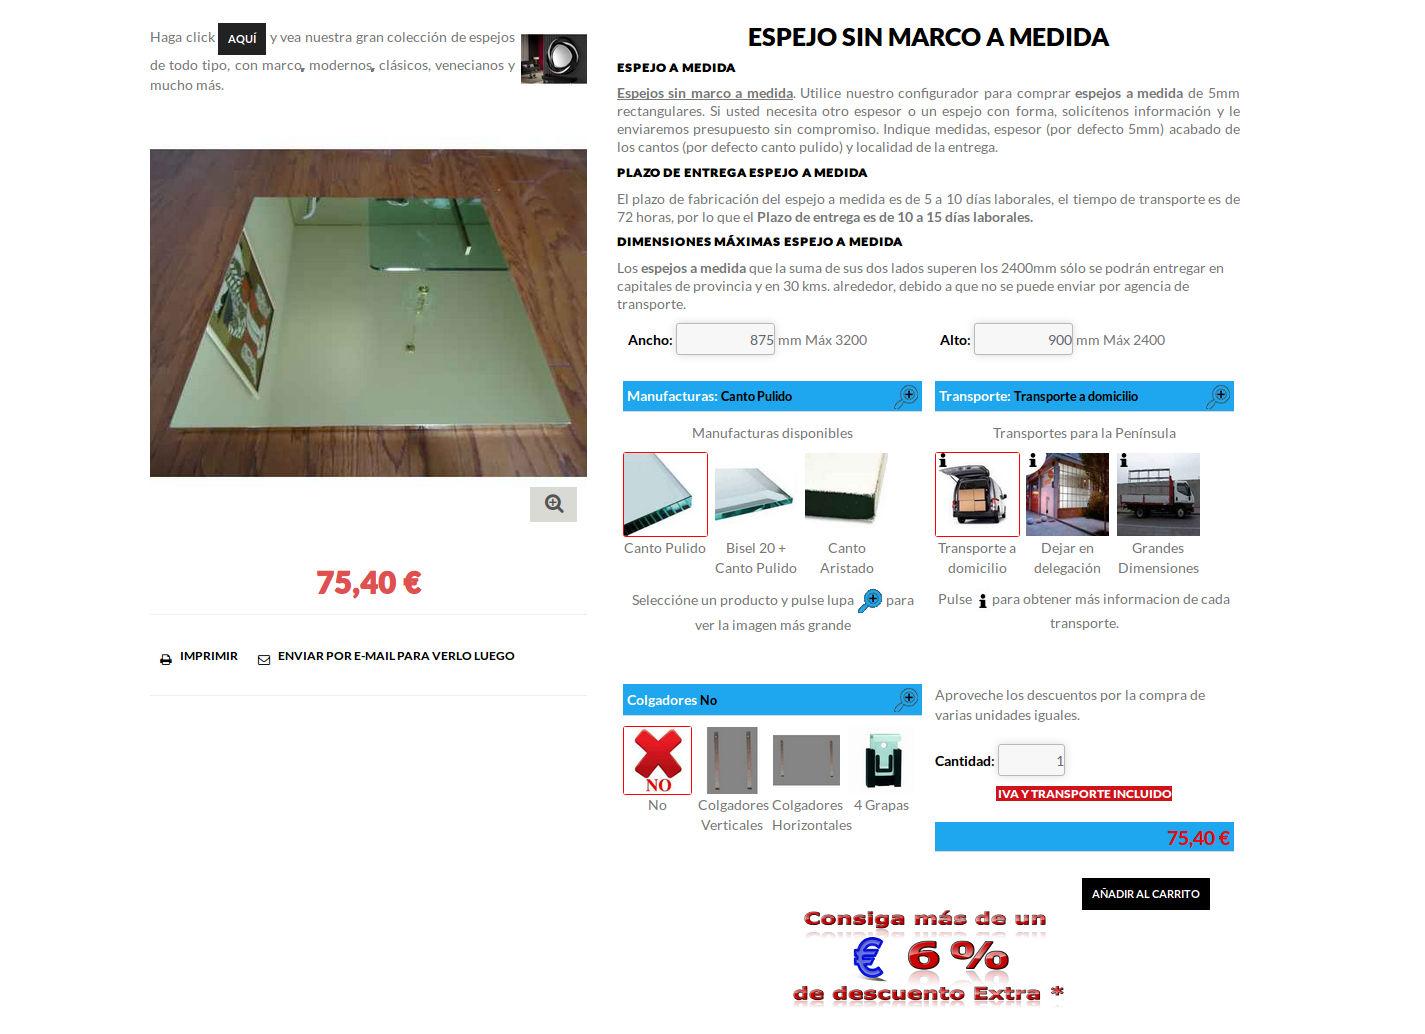 Espejo a medida theme for Espejos a medida online